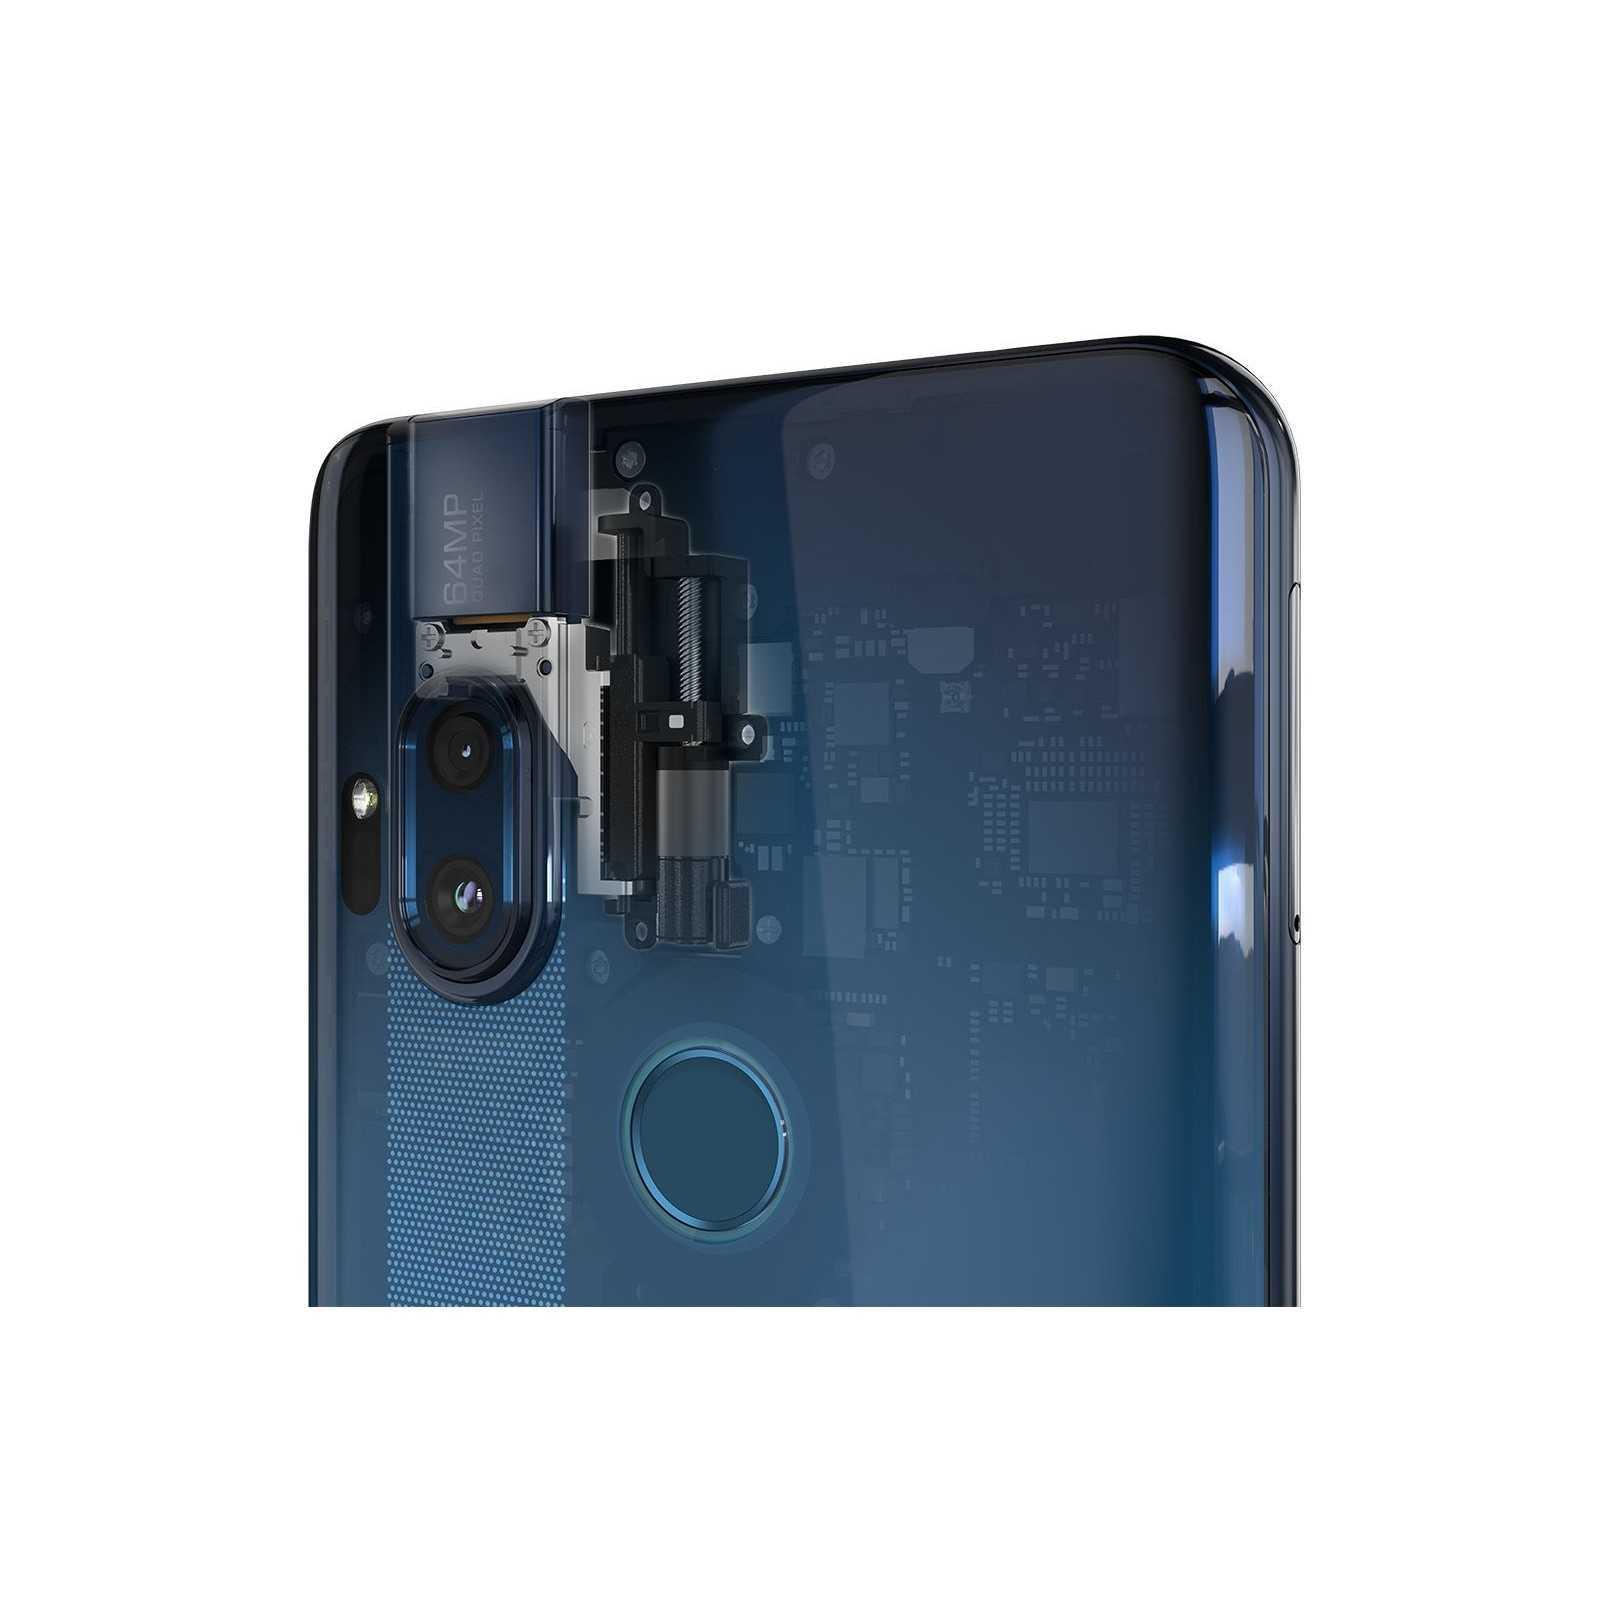 Самая странная камера смартфона получила престижную награду. нужна ли нам такая?